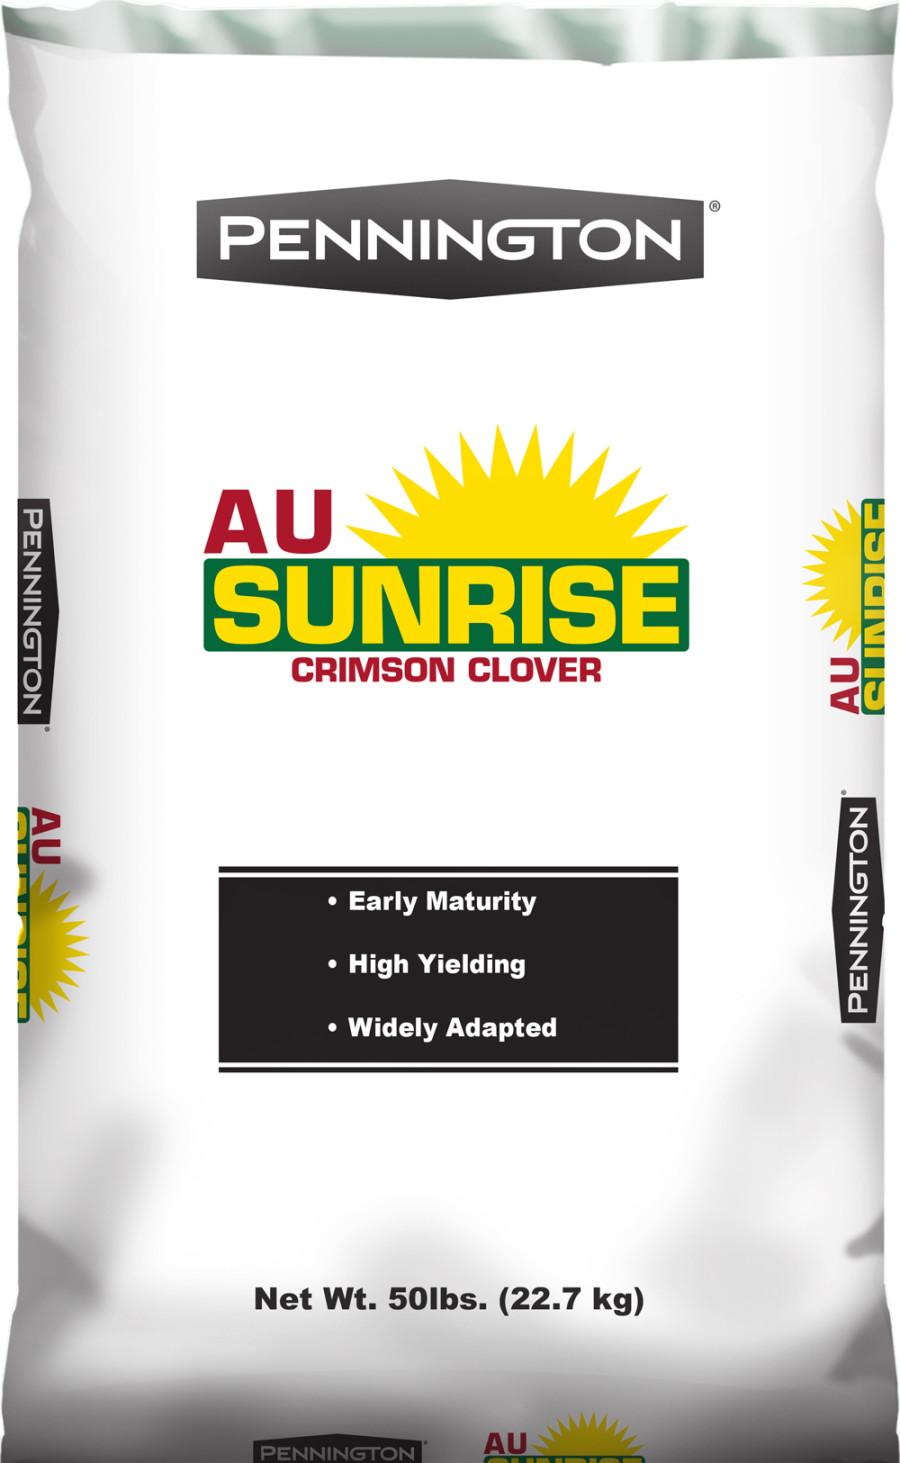 Pennington Crimson Clover Seed AU Sunrise Pre-Inoculated 50% CT 1ea/50 lb